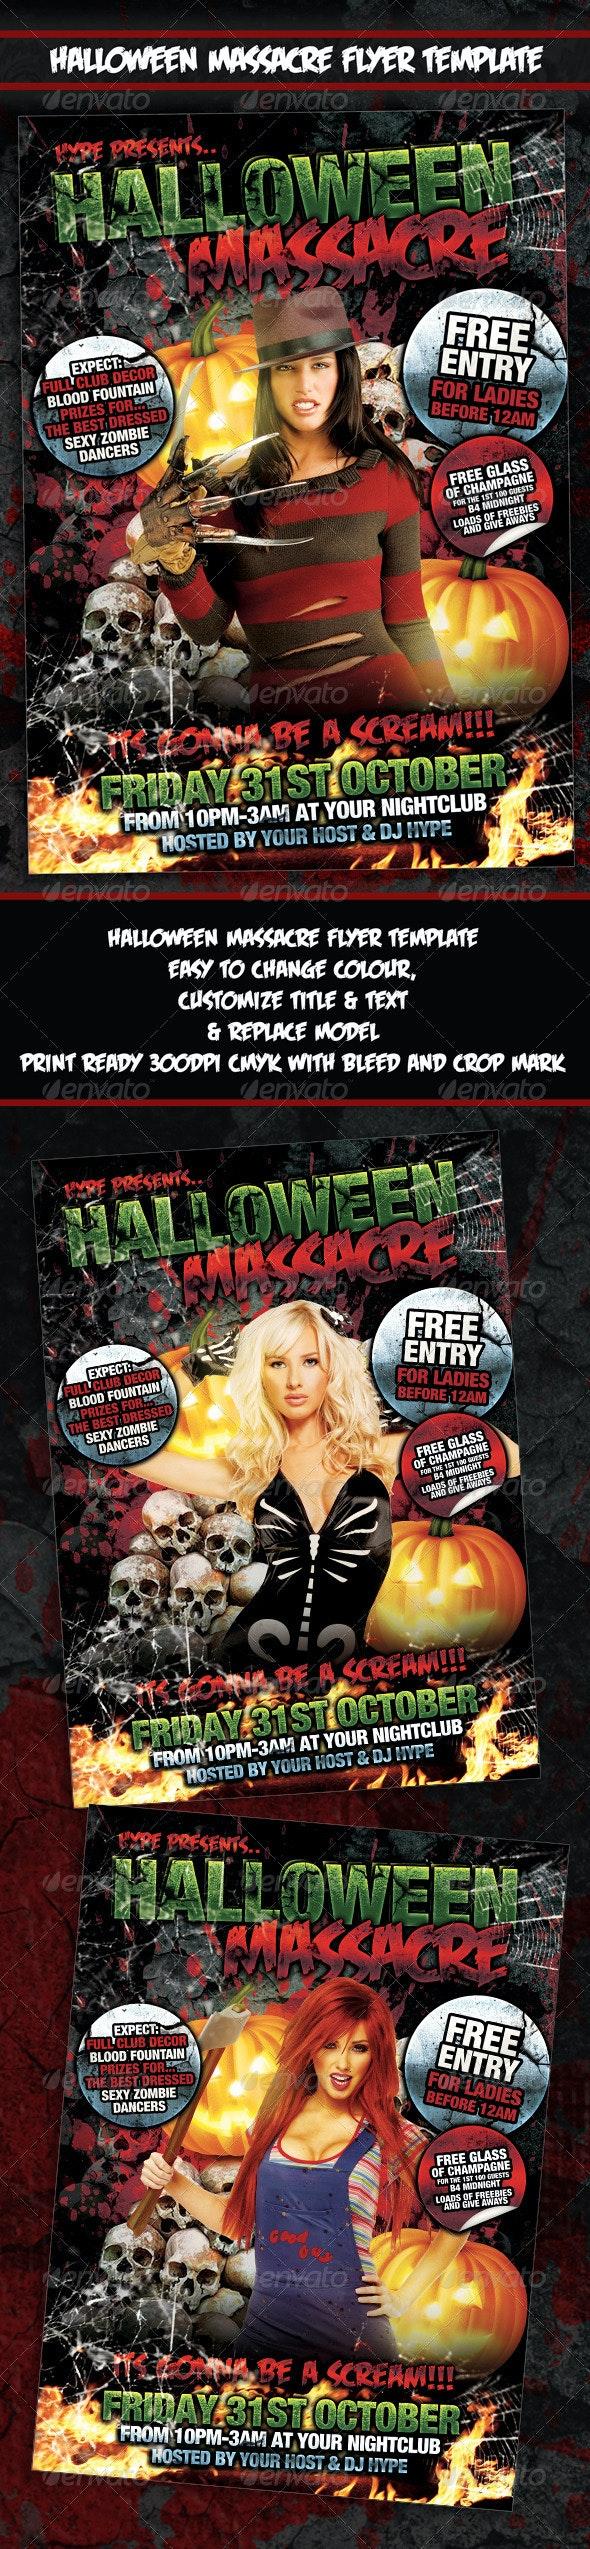 Halloween Massacre Flyer Poster Template - Holidays Events